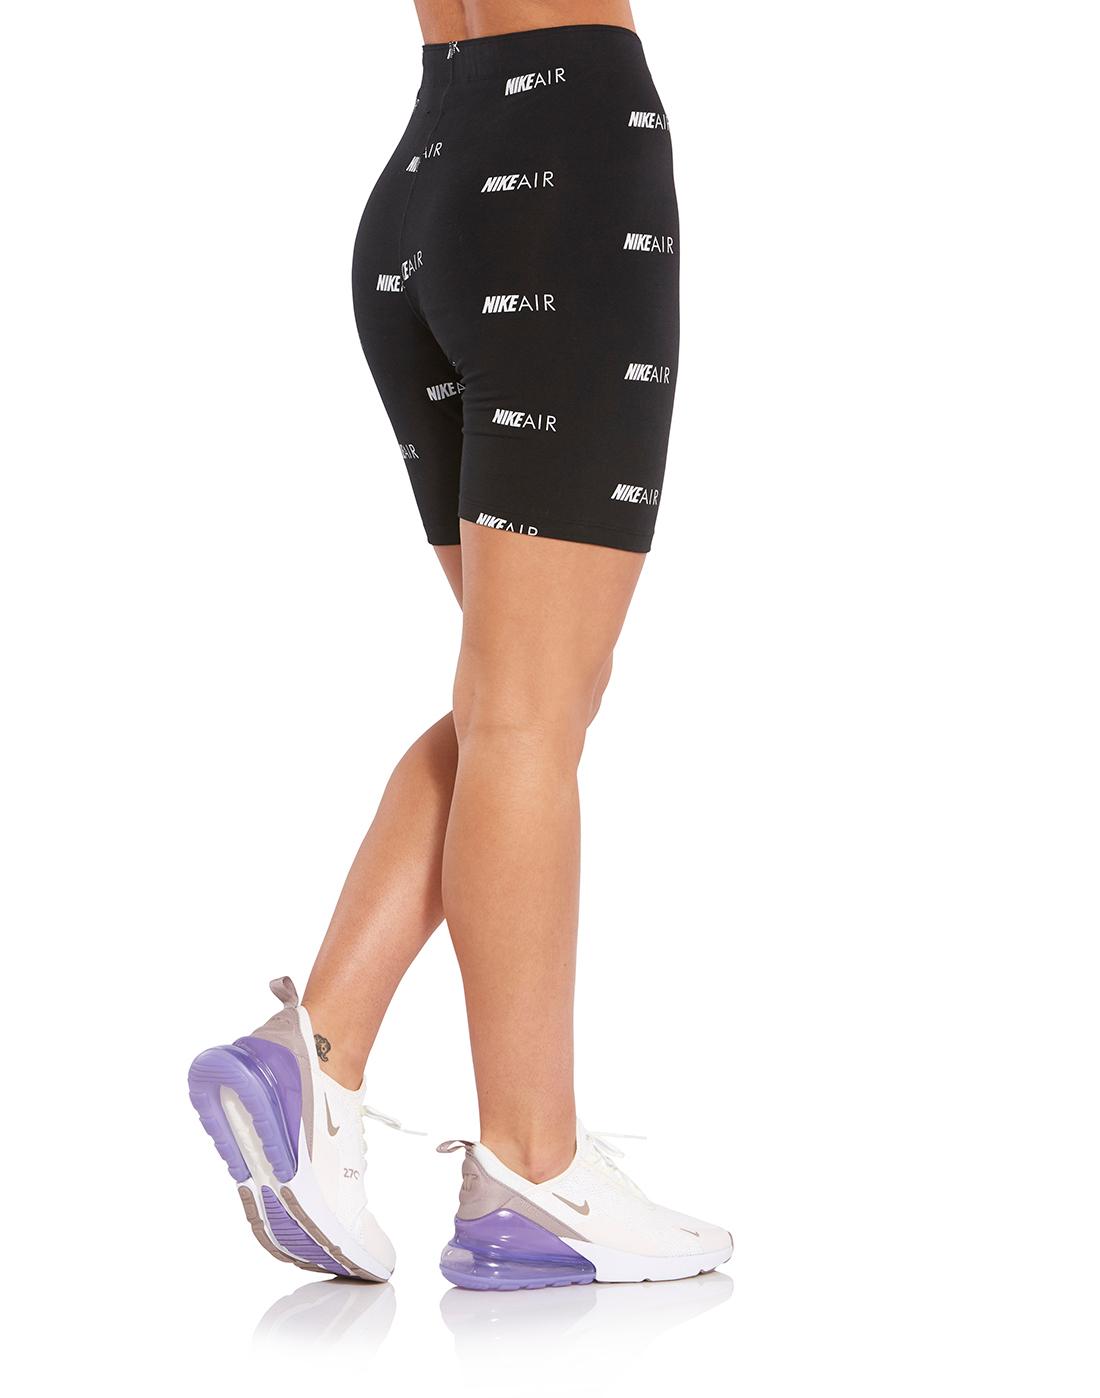 4c1acf1b29e Womens Air Cycling Short · Womens Air Cycling Short